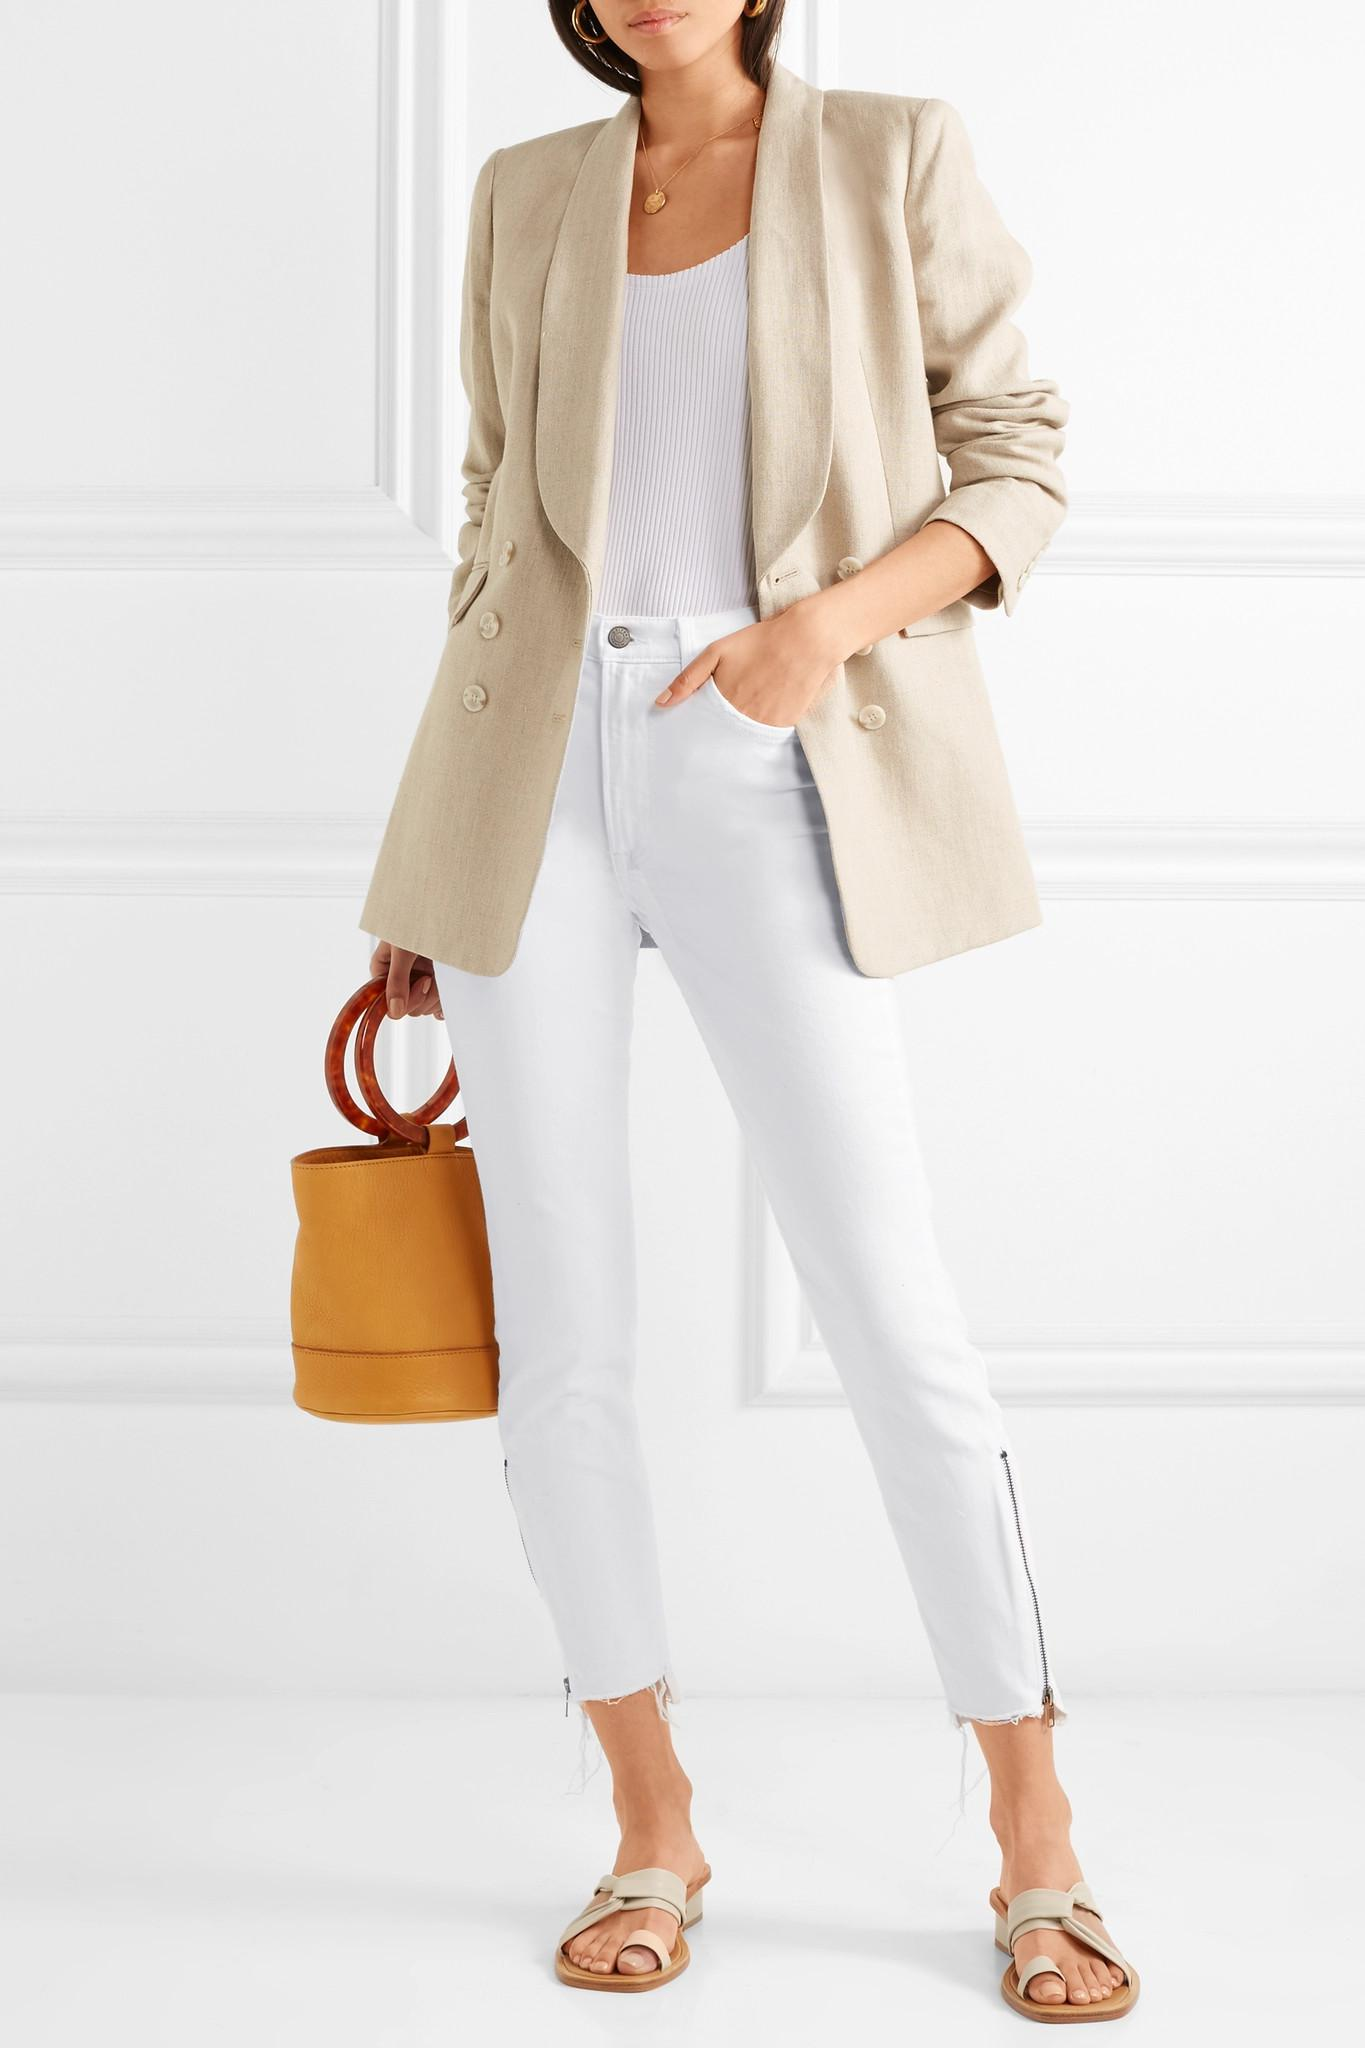 Kendall White Rise Lyst Distressed Skinny High Grlfrnd Jeans HaBx57w7 829461cbb97